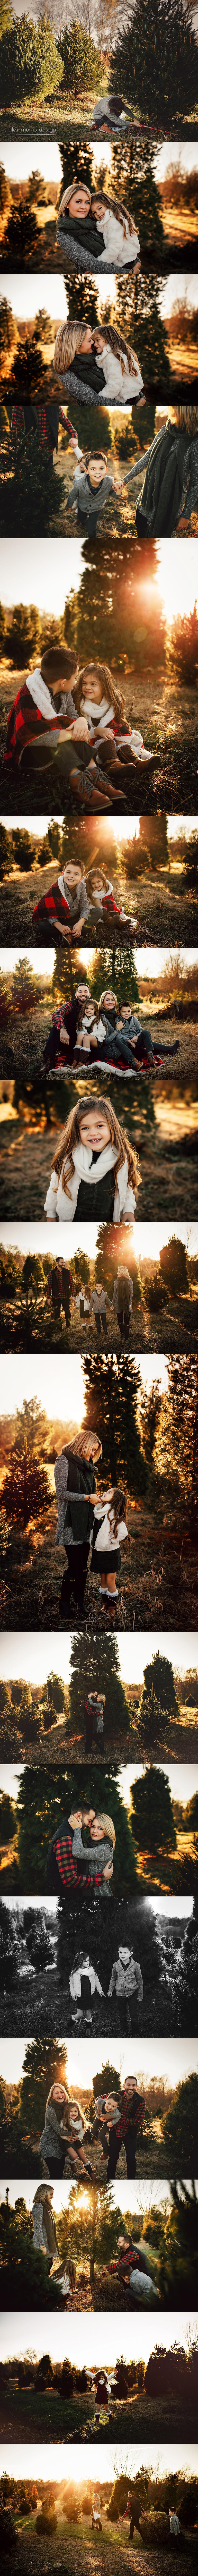 Indianapolis Family Photographer   Alex Morris Design